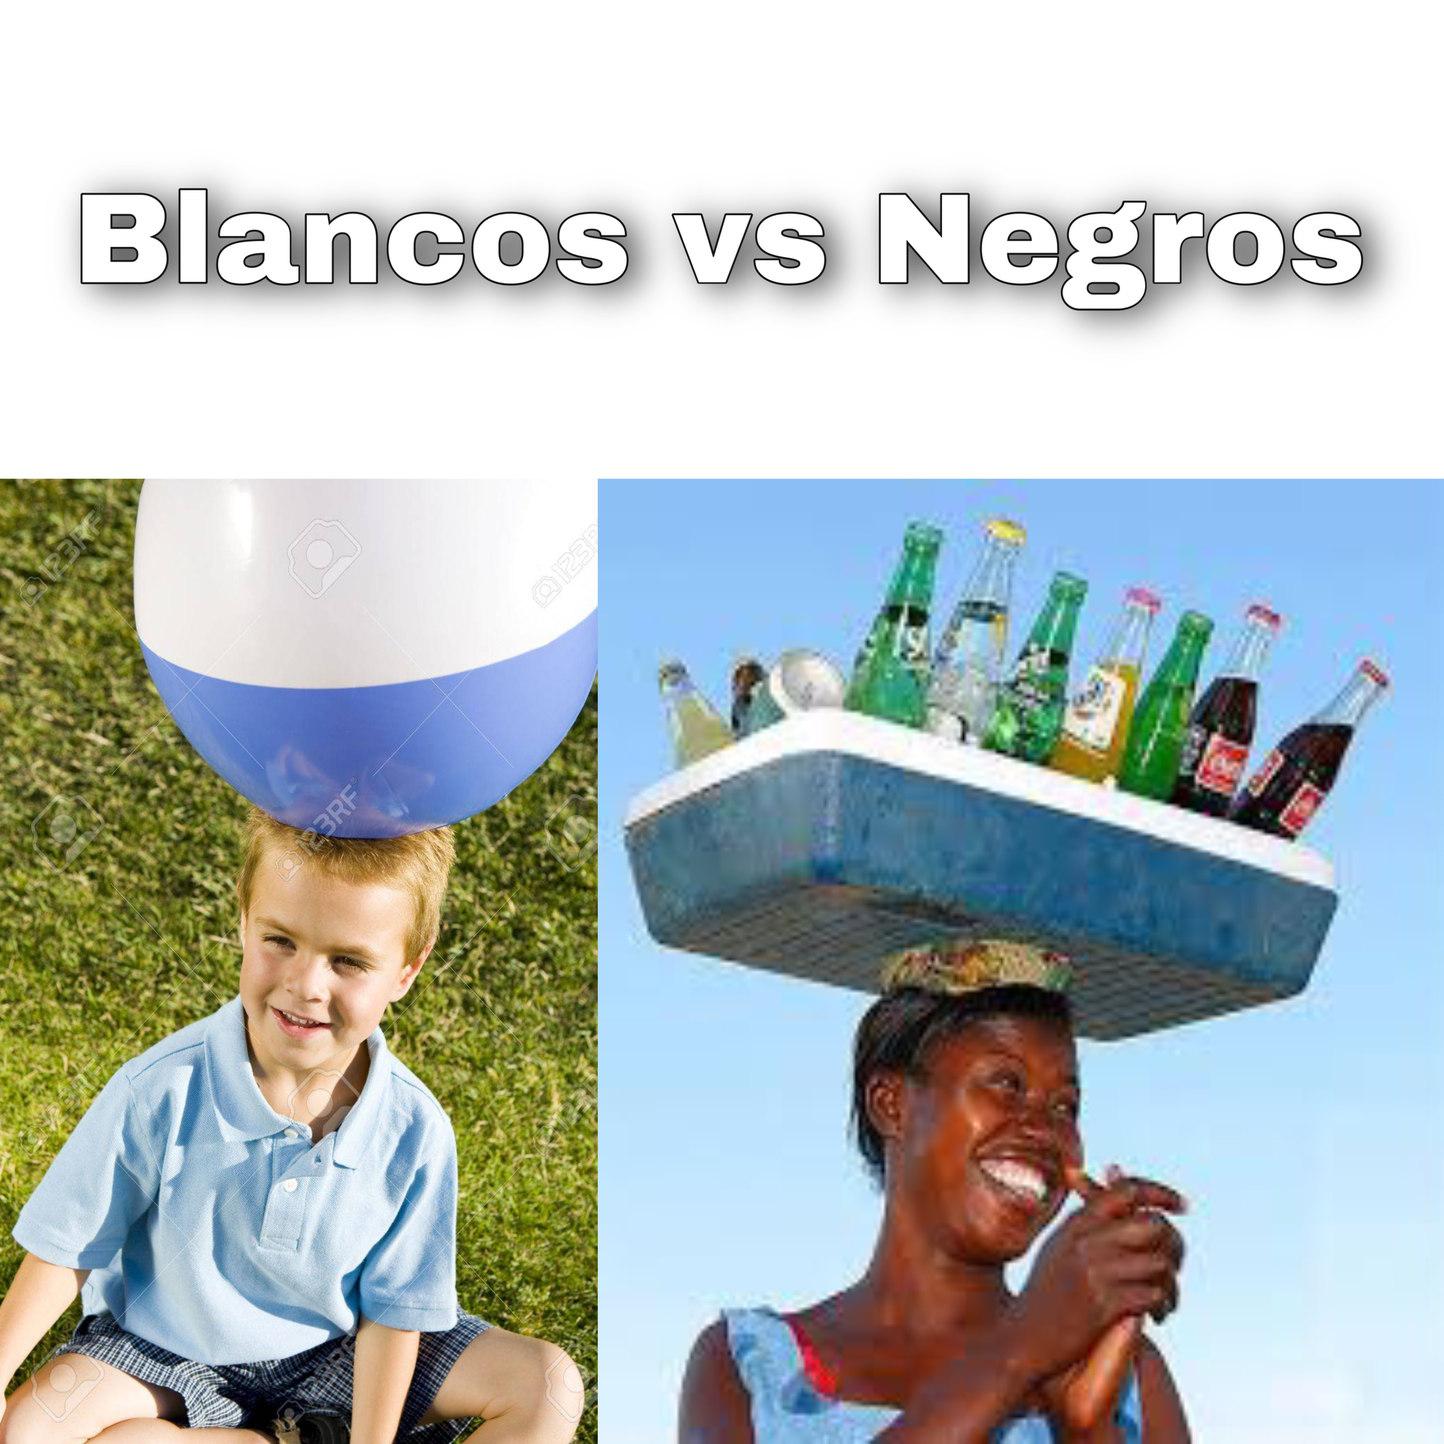 Blancos vs Negros - meme